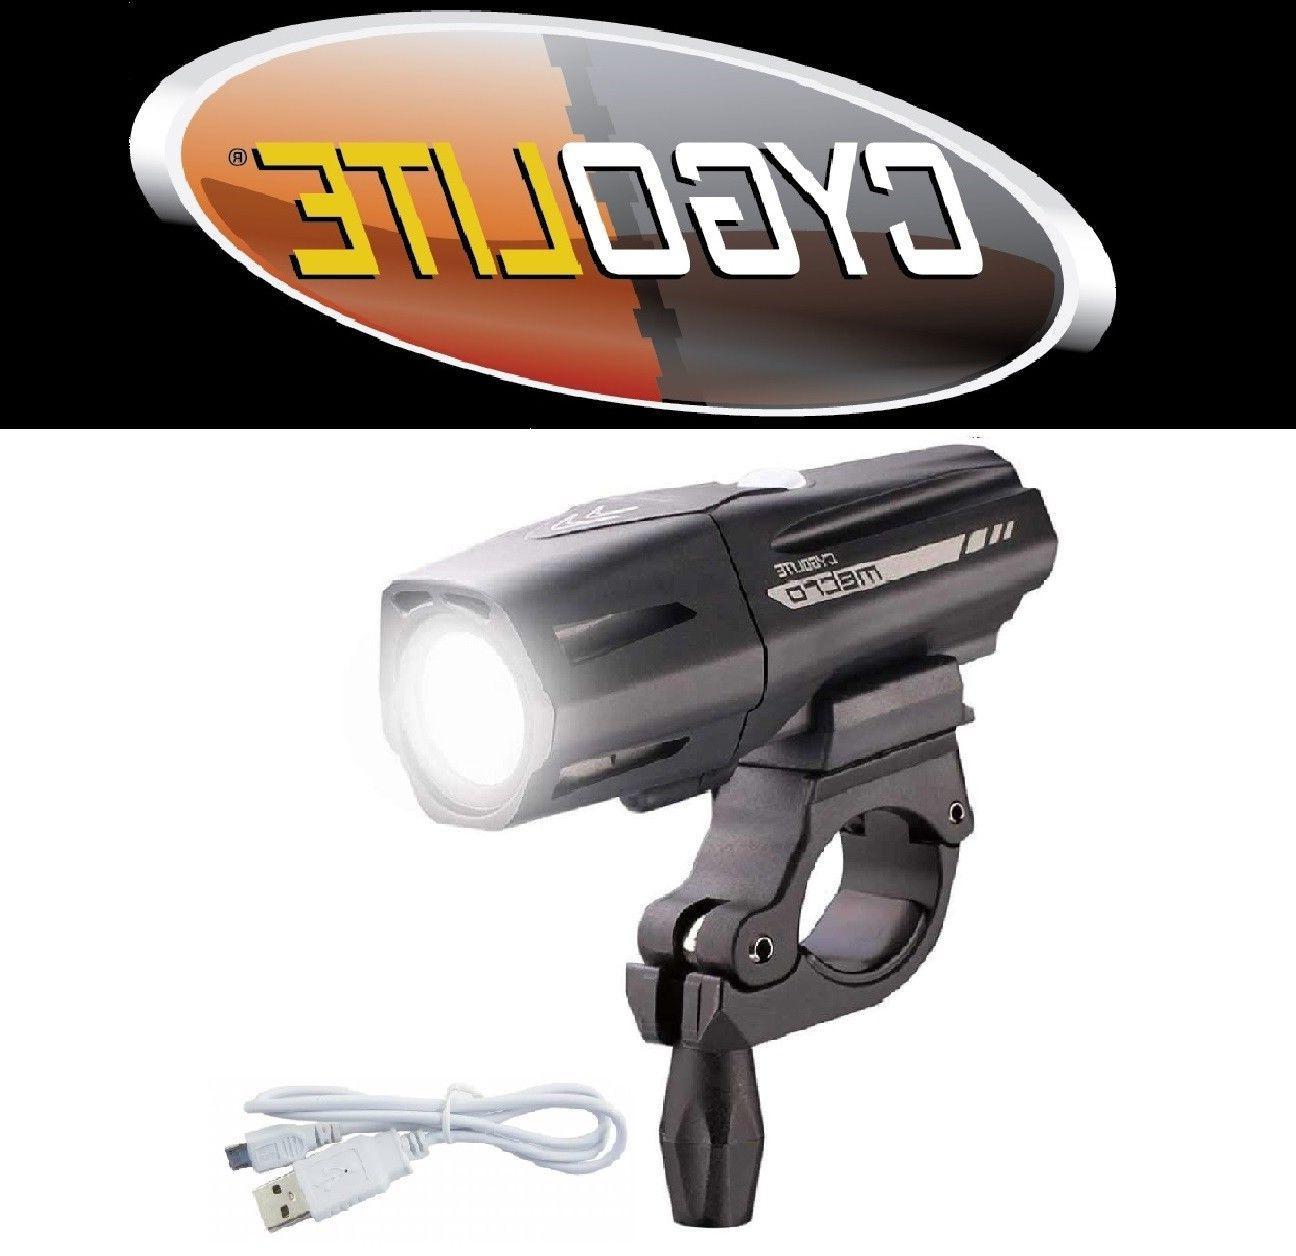 NEW Cygolite Metro Plus 650 Lumens Headlight Bike Light USB